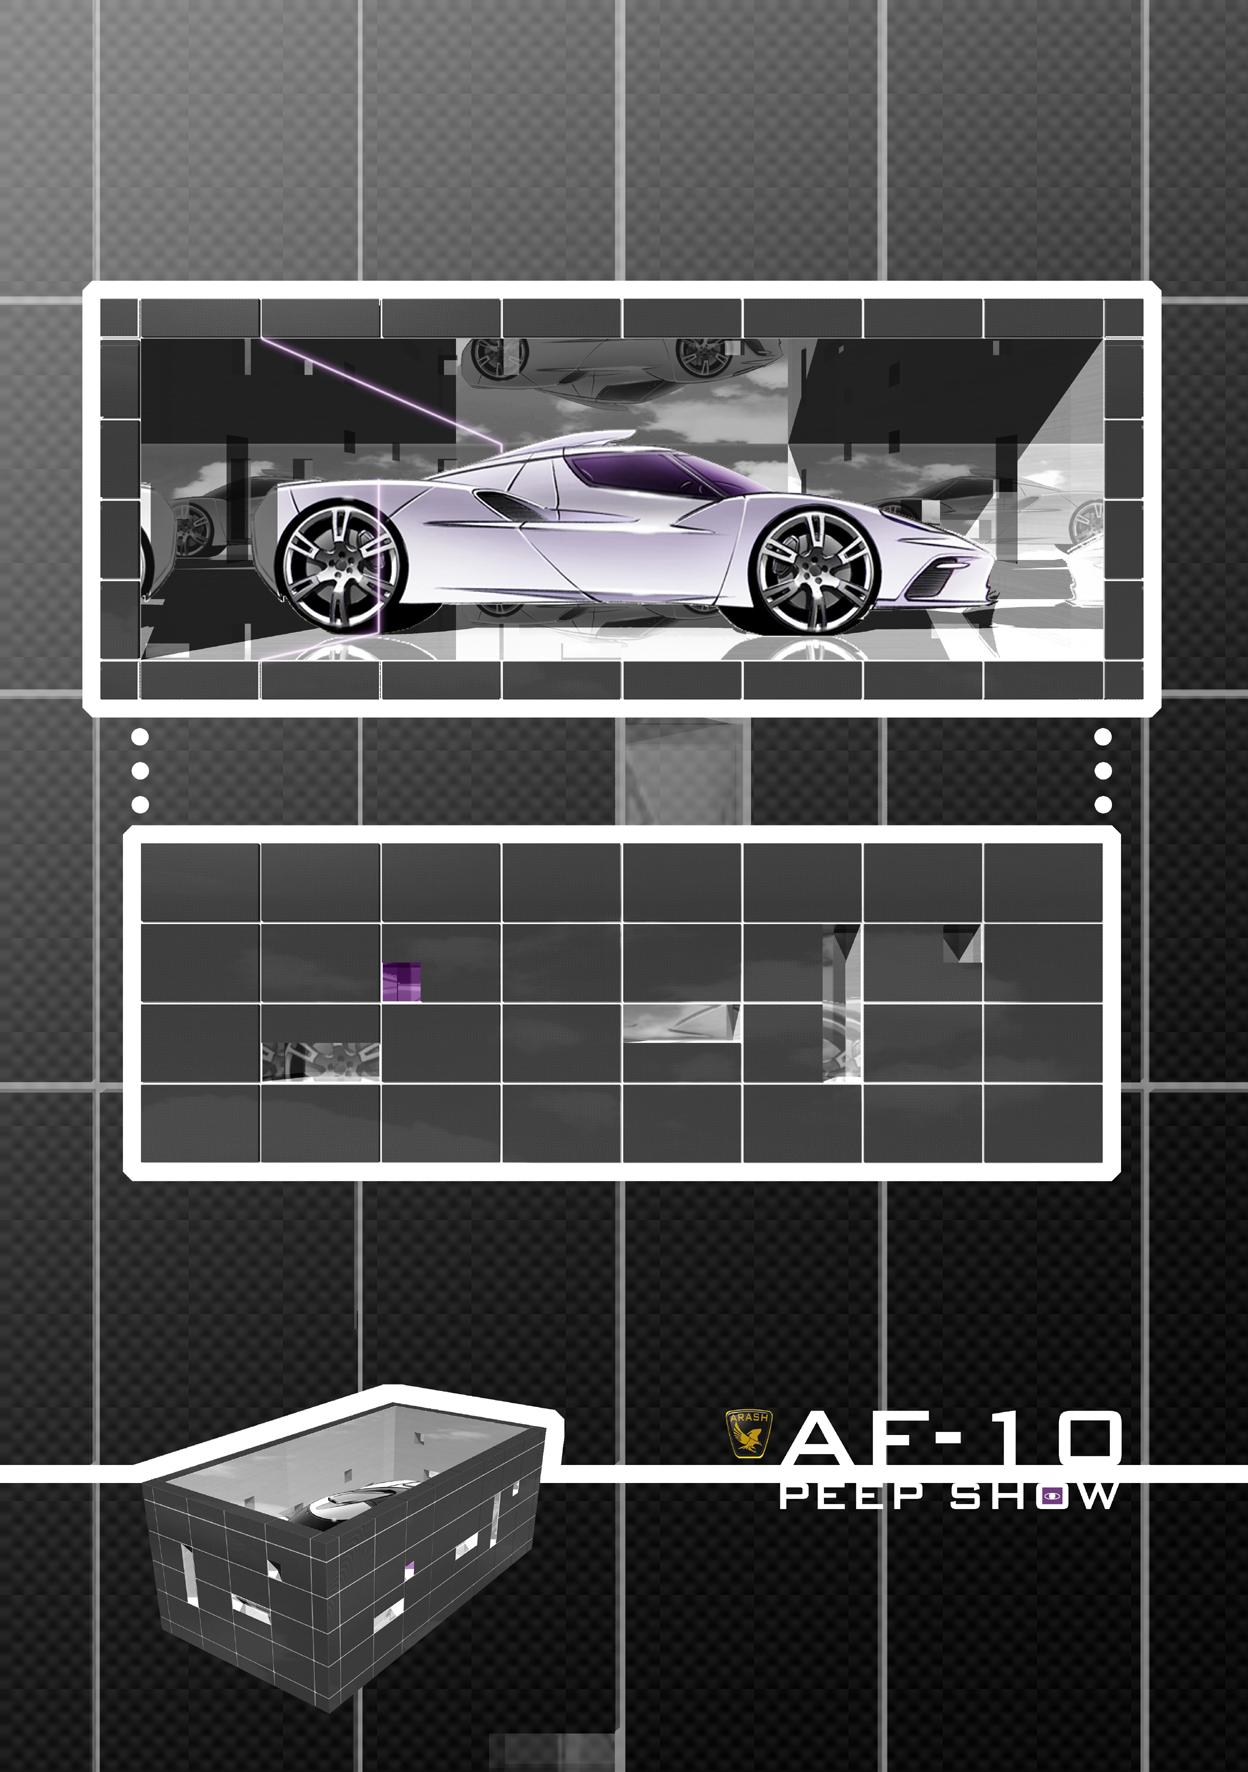 Arash Motor Company Peep Show Concept AF-10